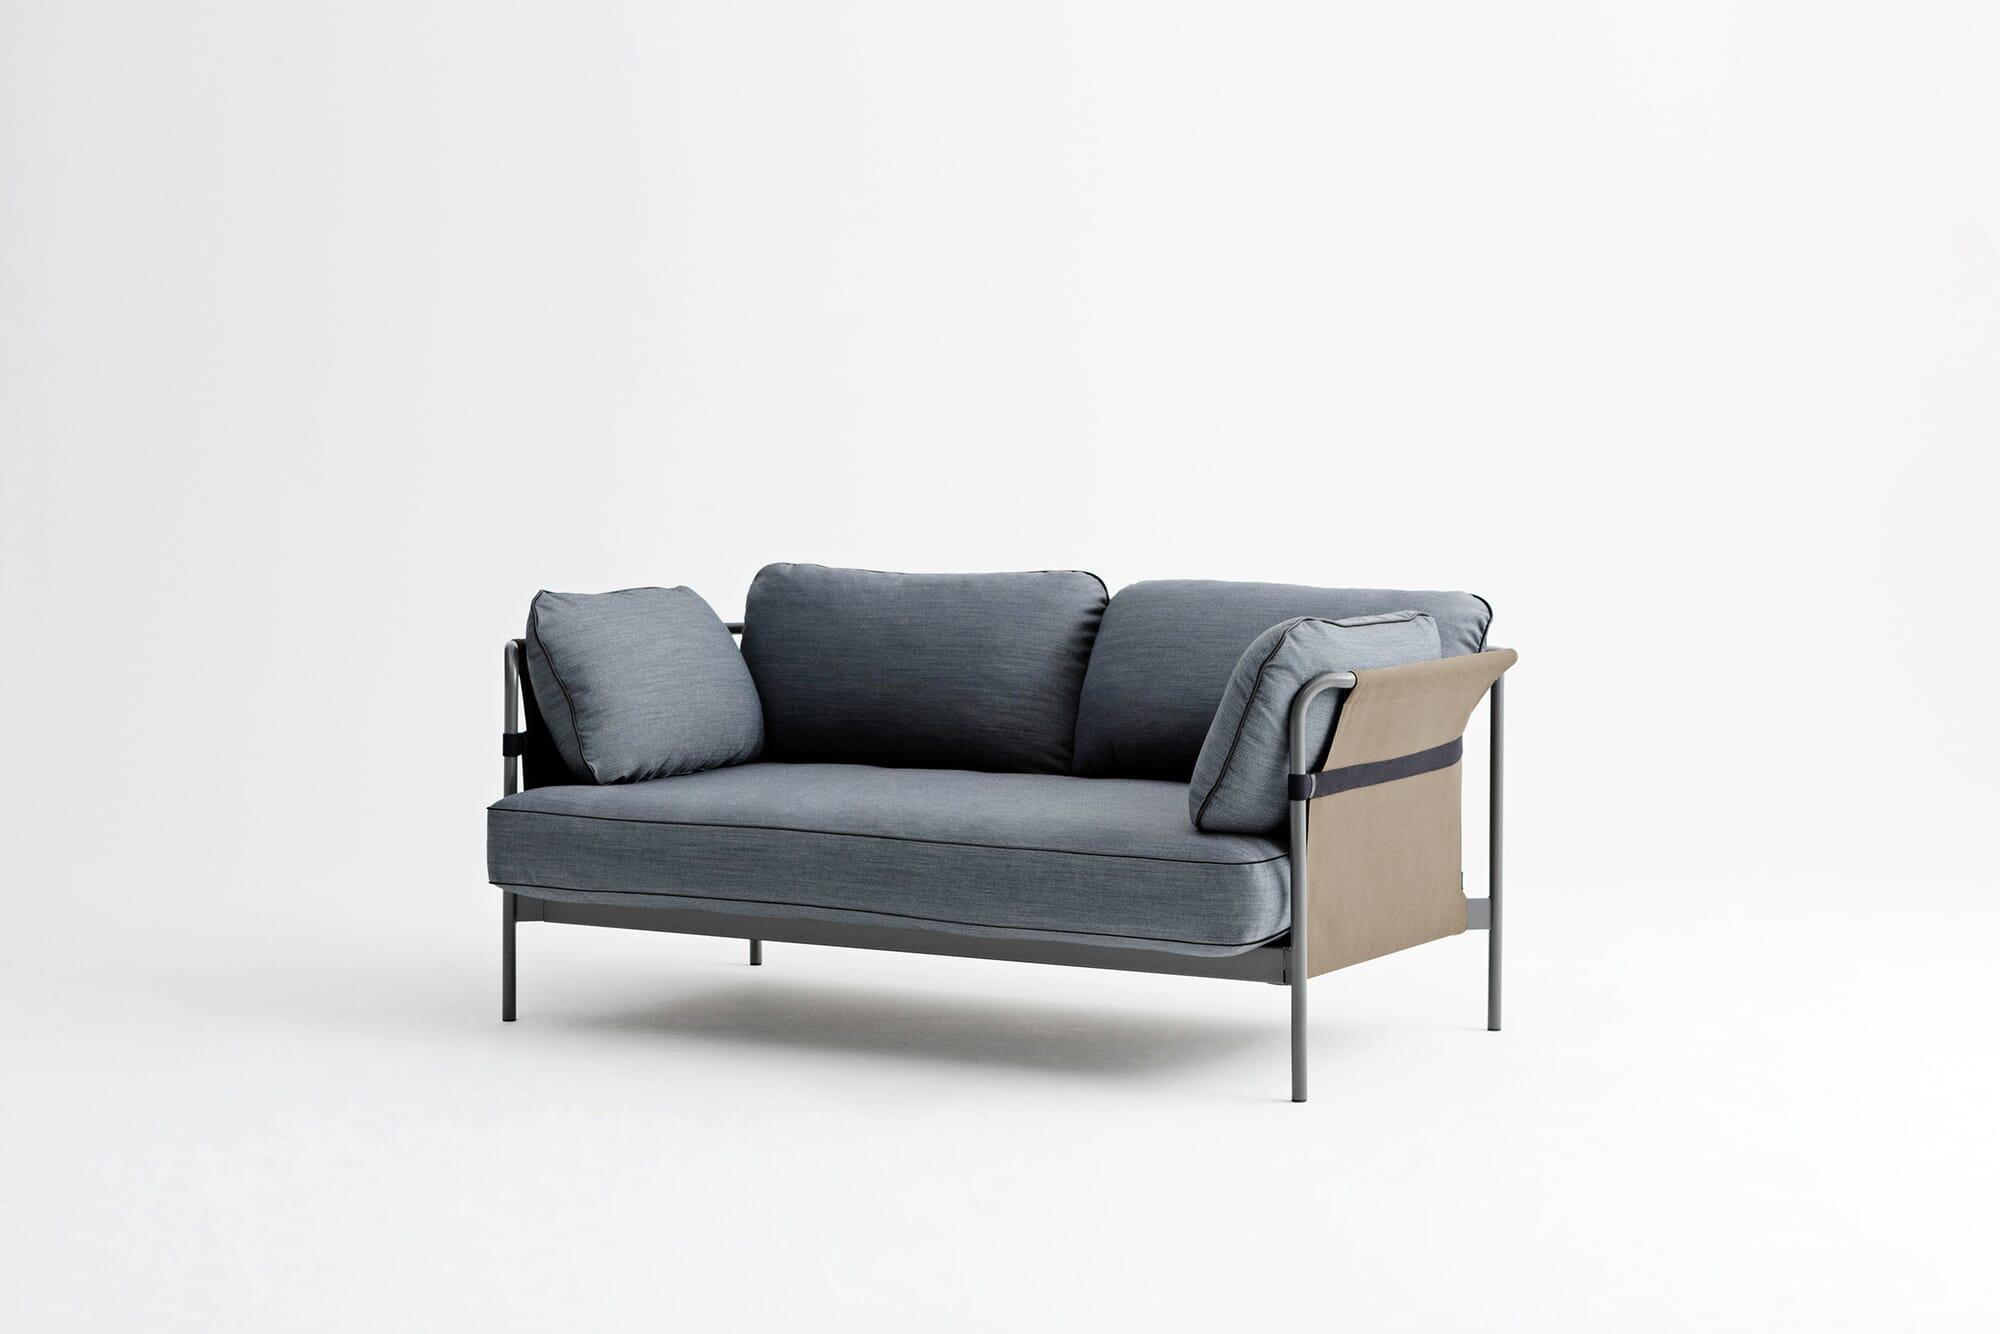 Nett Couch Modern ~ Frittstende badekar great ikea hyskap komfyr u med